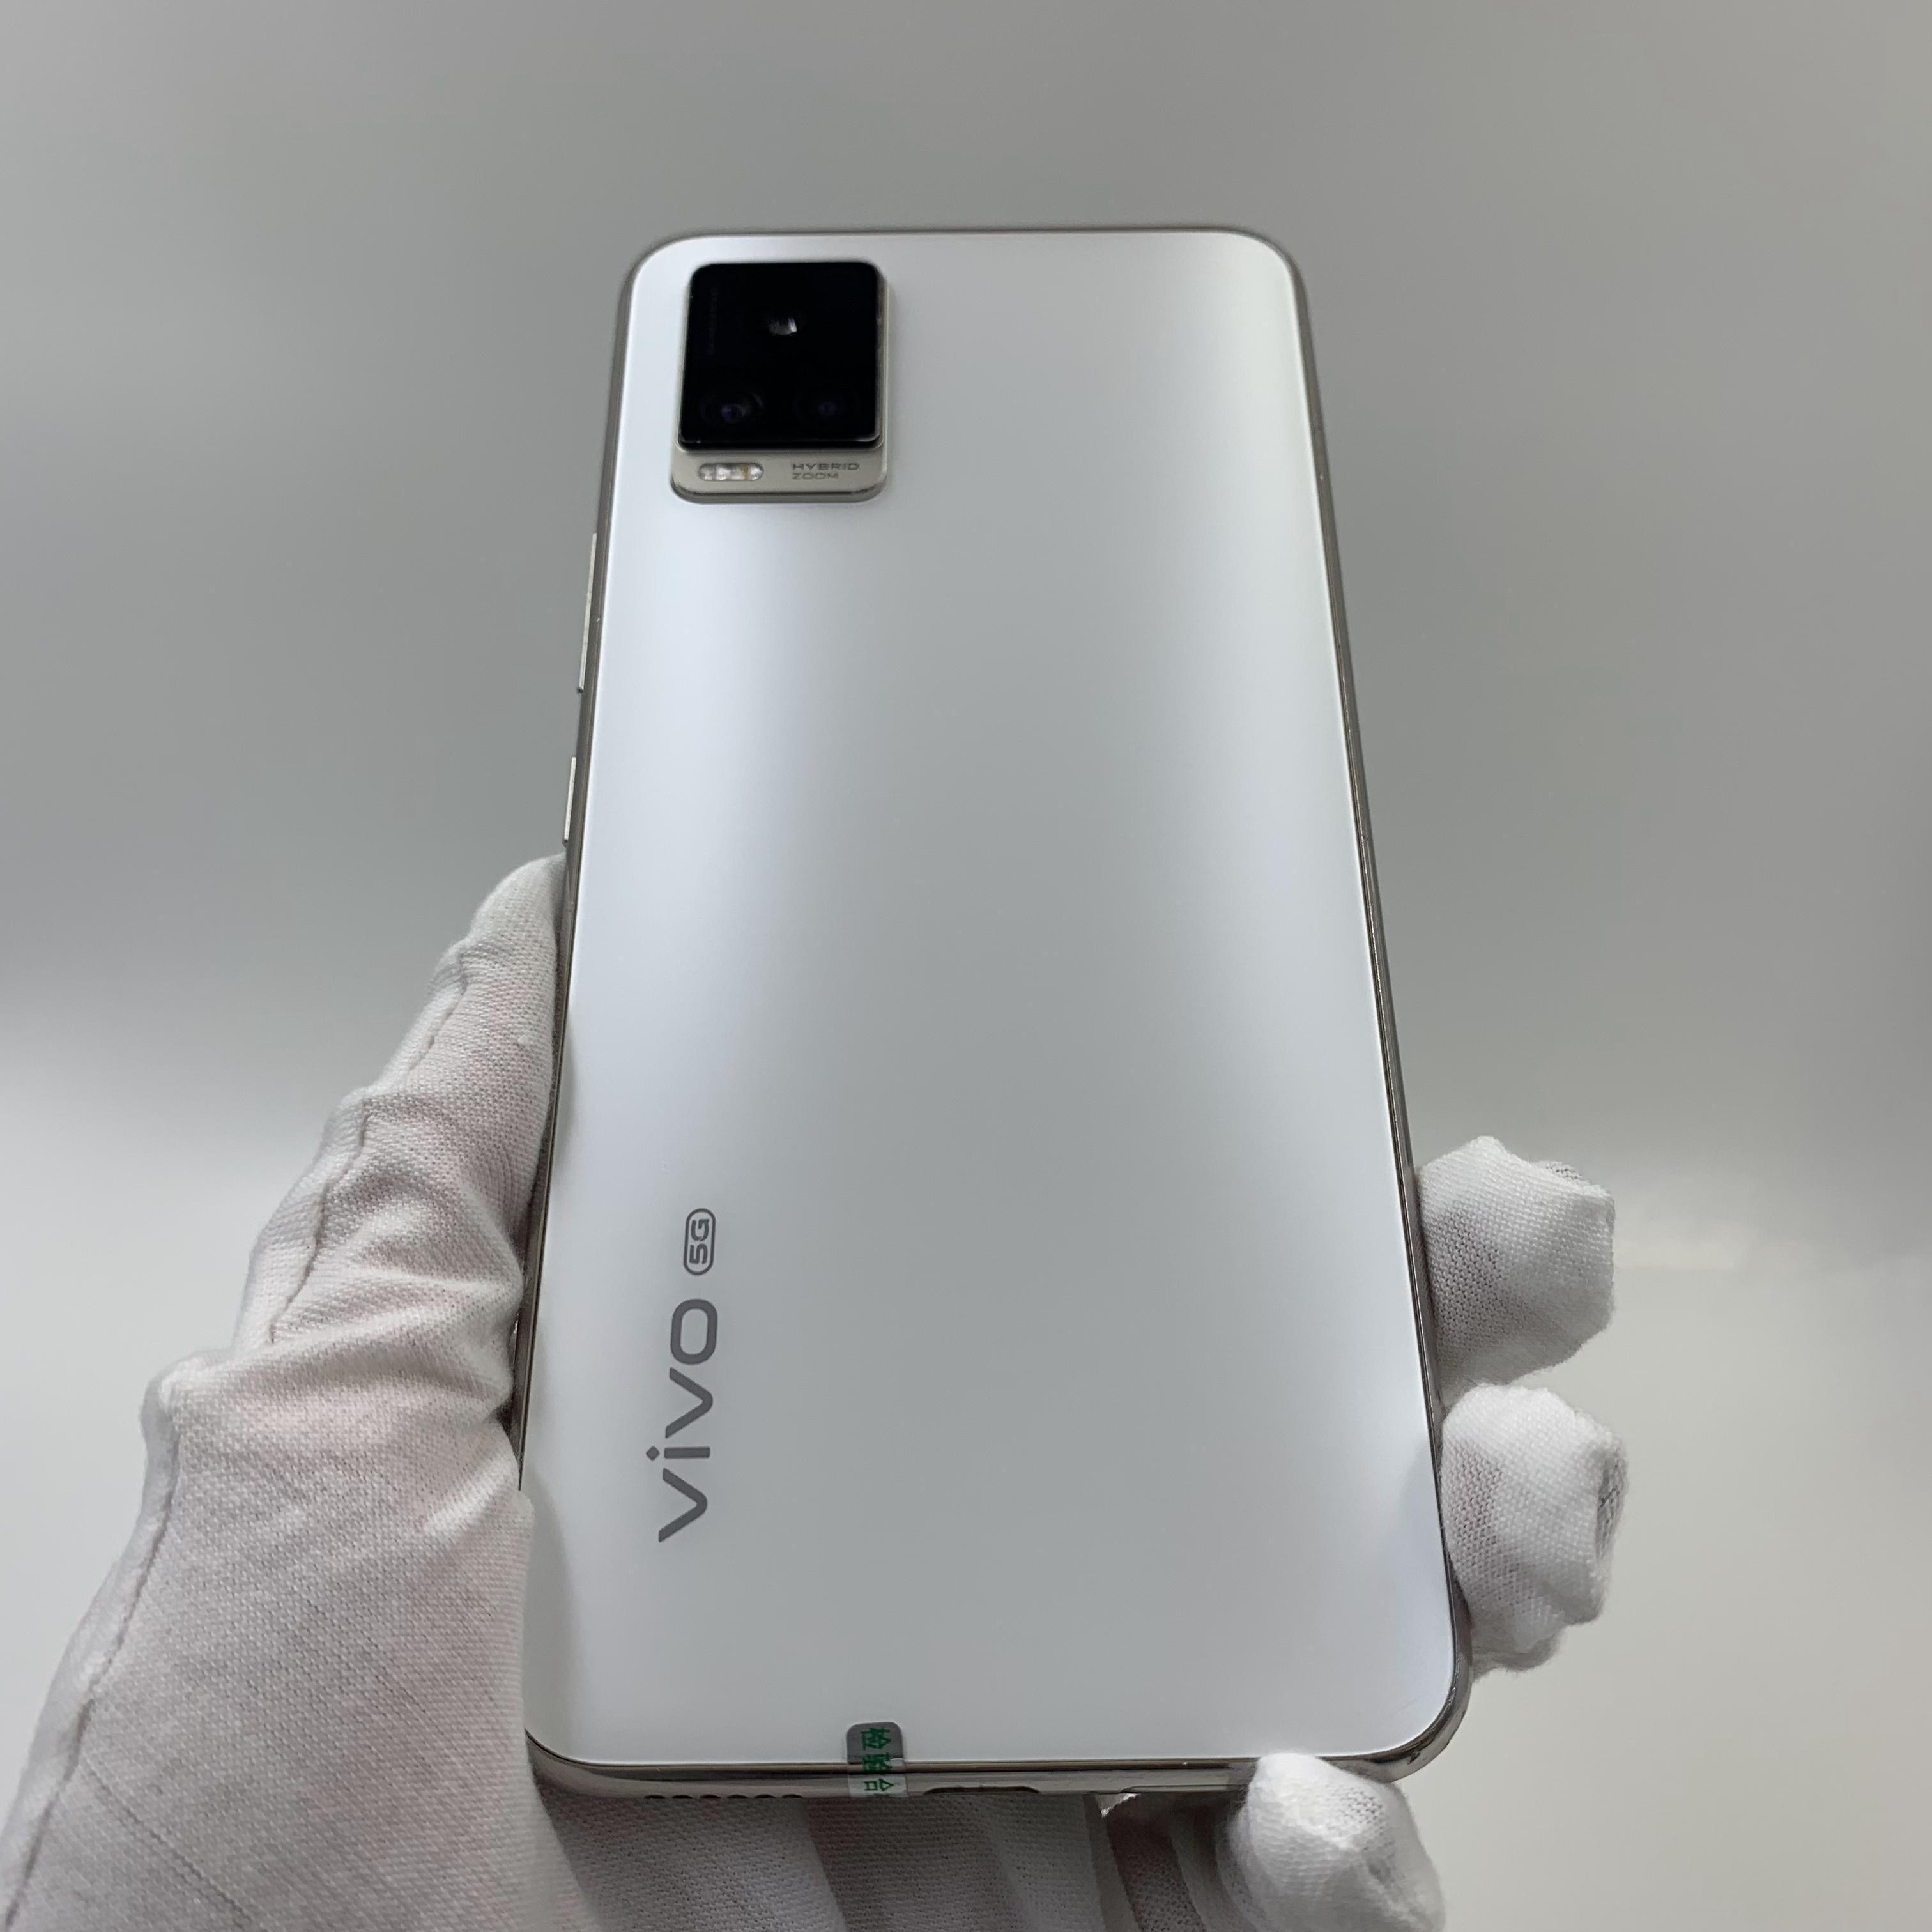 vivo【S7 5G】5G全网通 月光白 8G/128G 国行 9成新 真机实拍